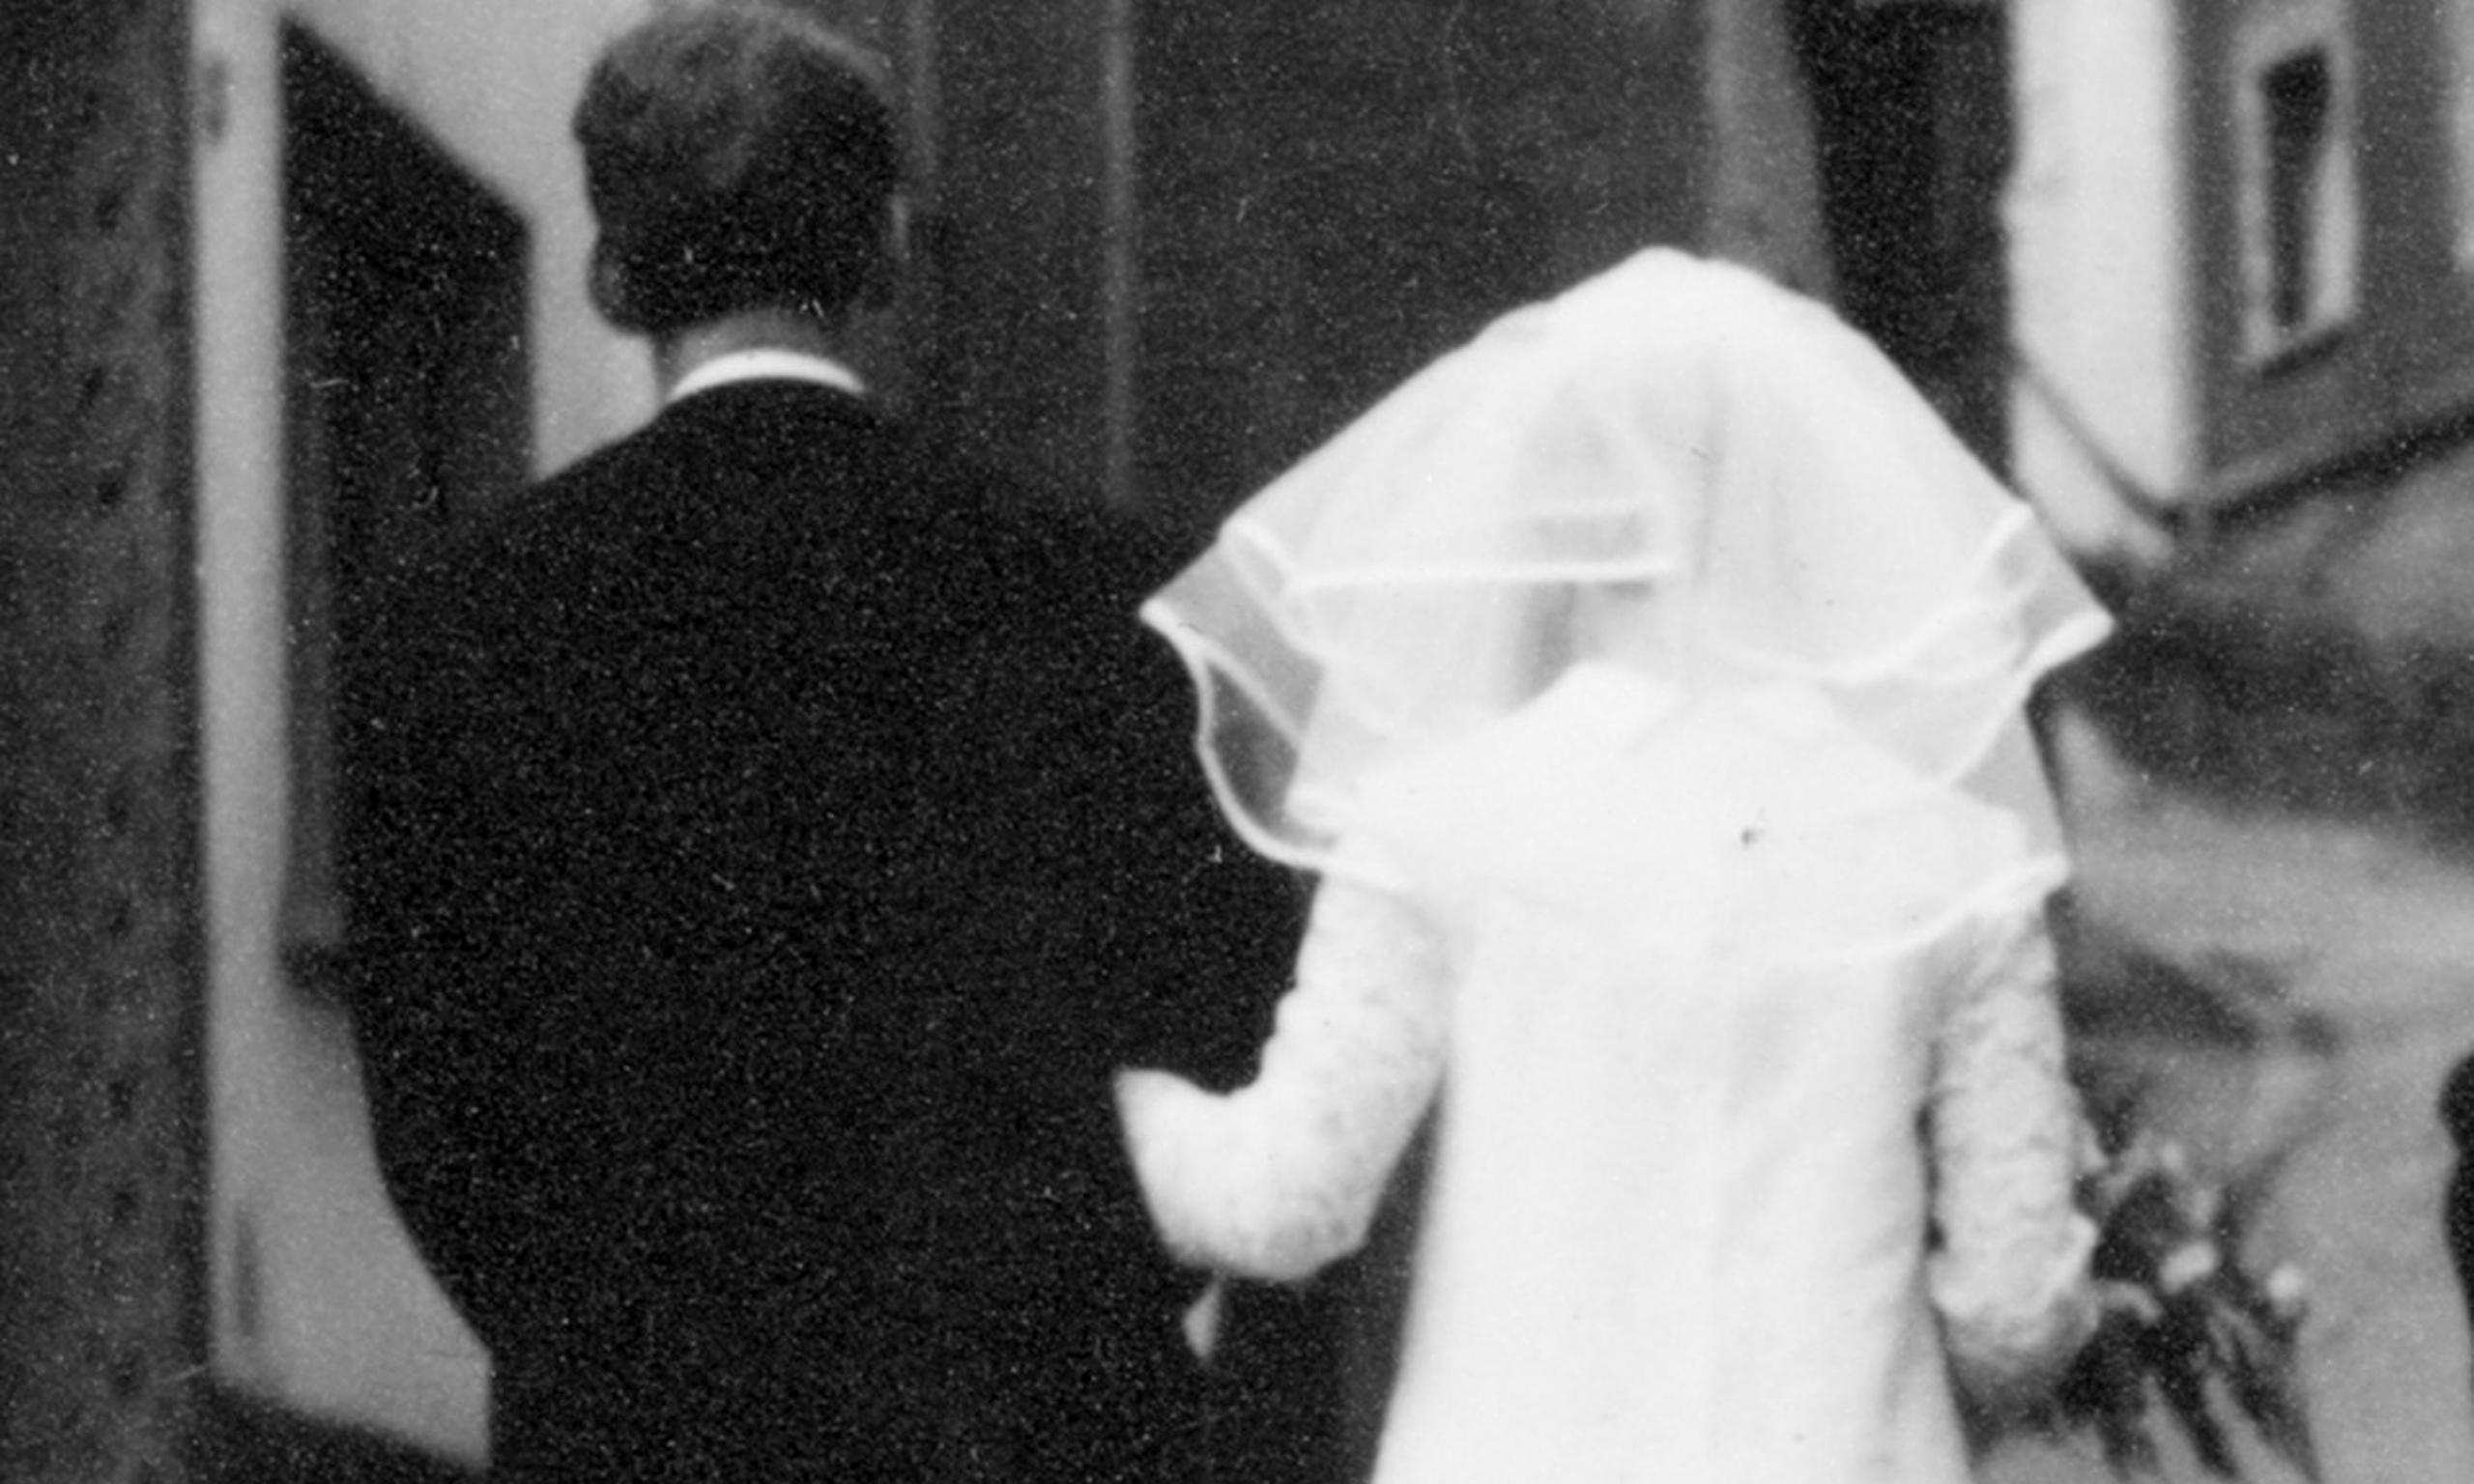 Philip Larkin Special Train Marks 50th Birthday Of Whitsun Weddings Poem